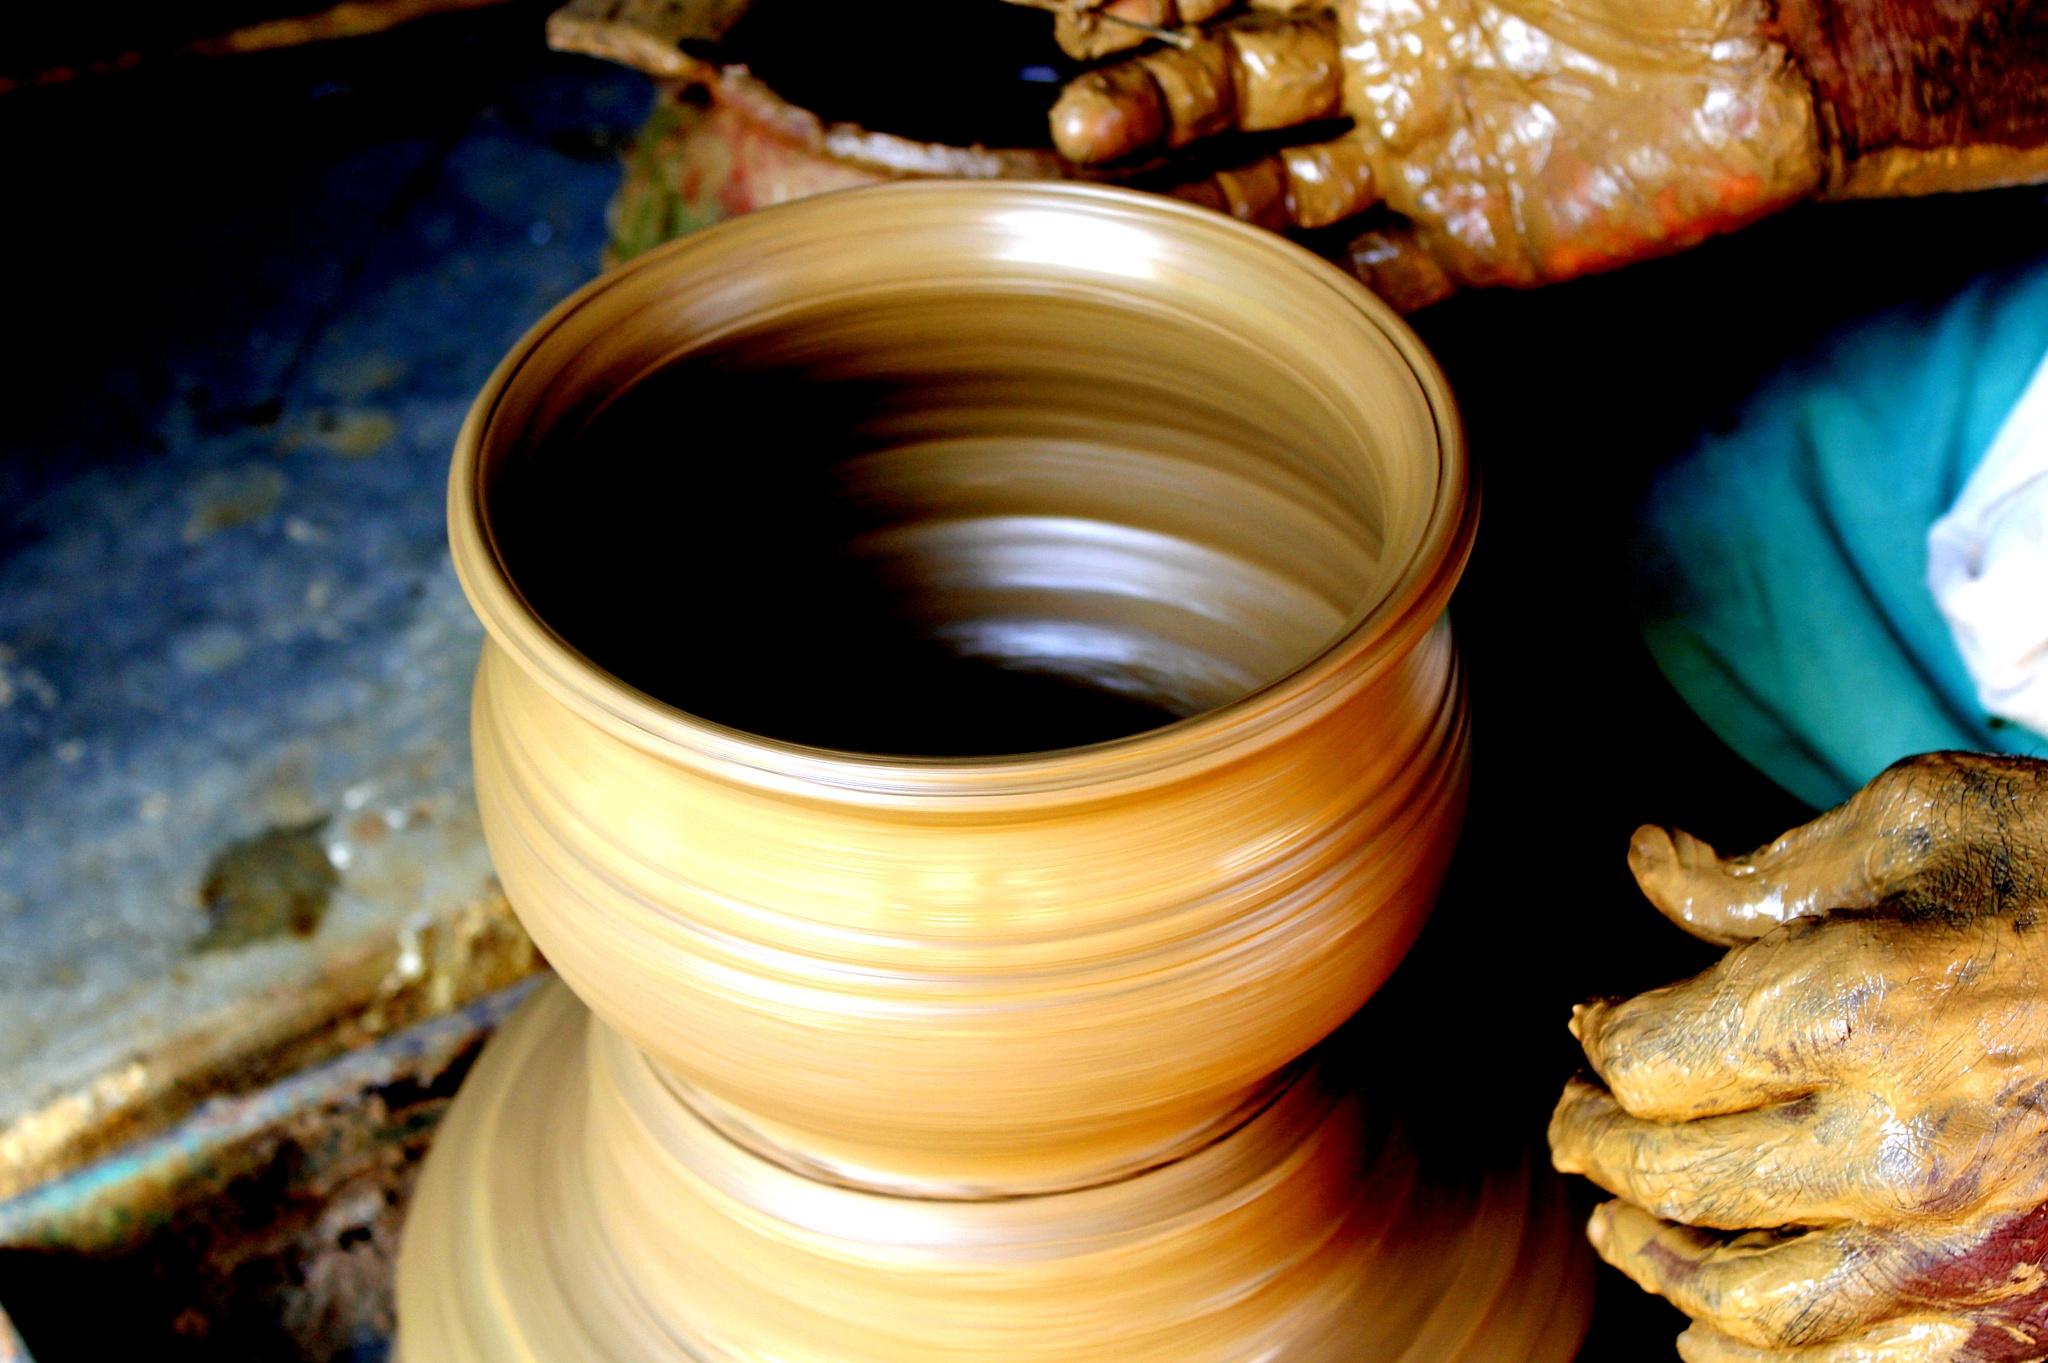 Pottery by Sayeeram Rengaraj